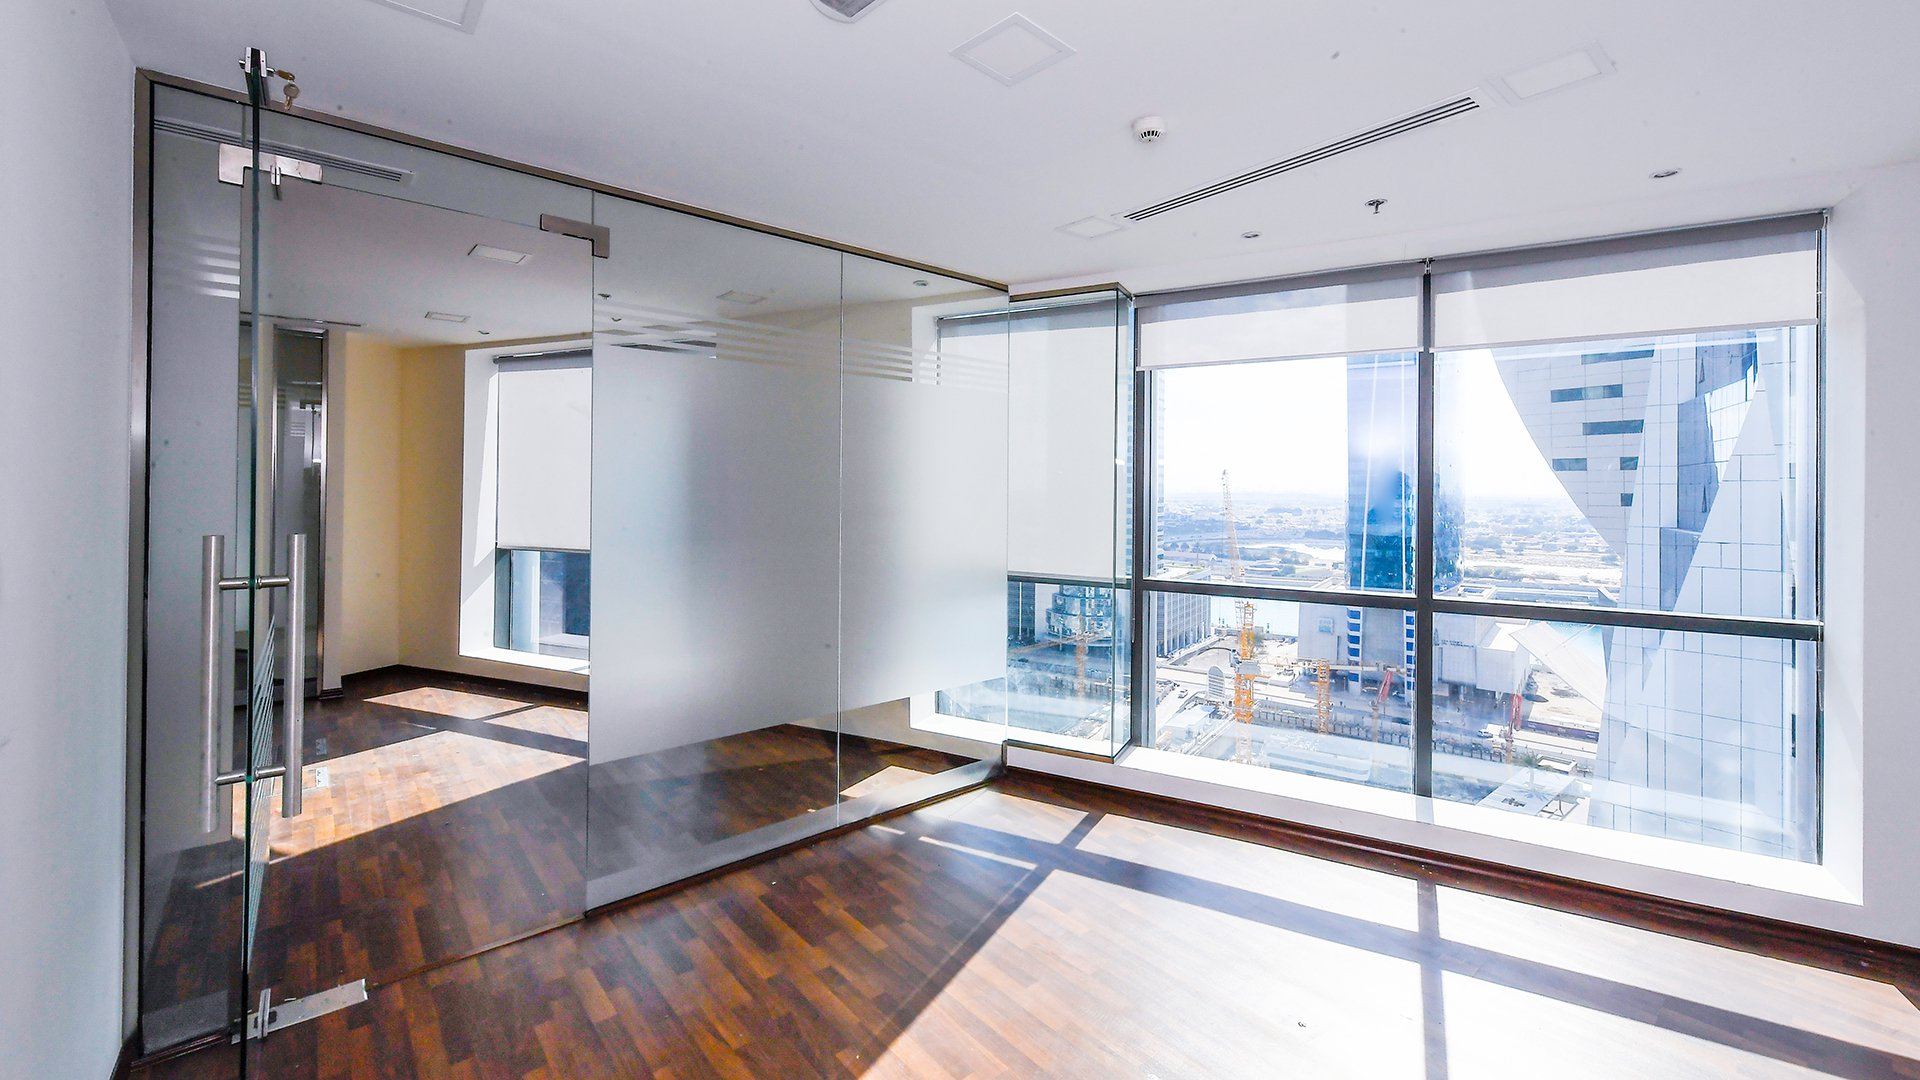 Ad Sale Office Business Bay The Regal Tower ref:V0237DU